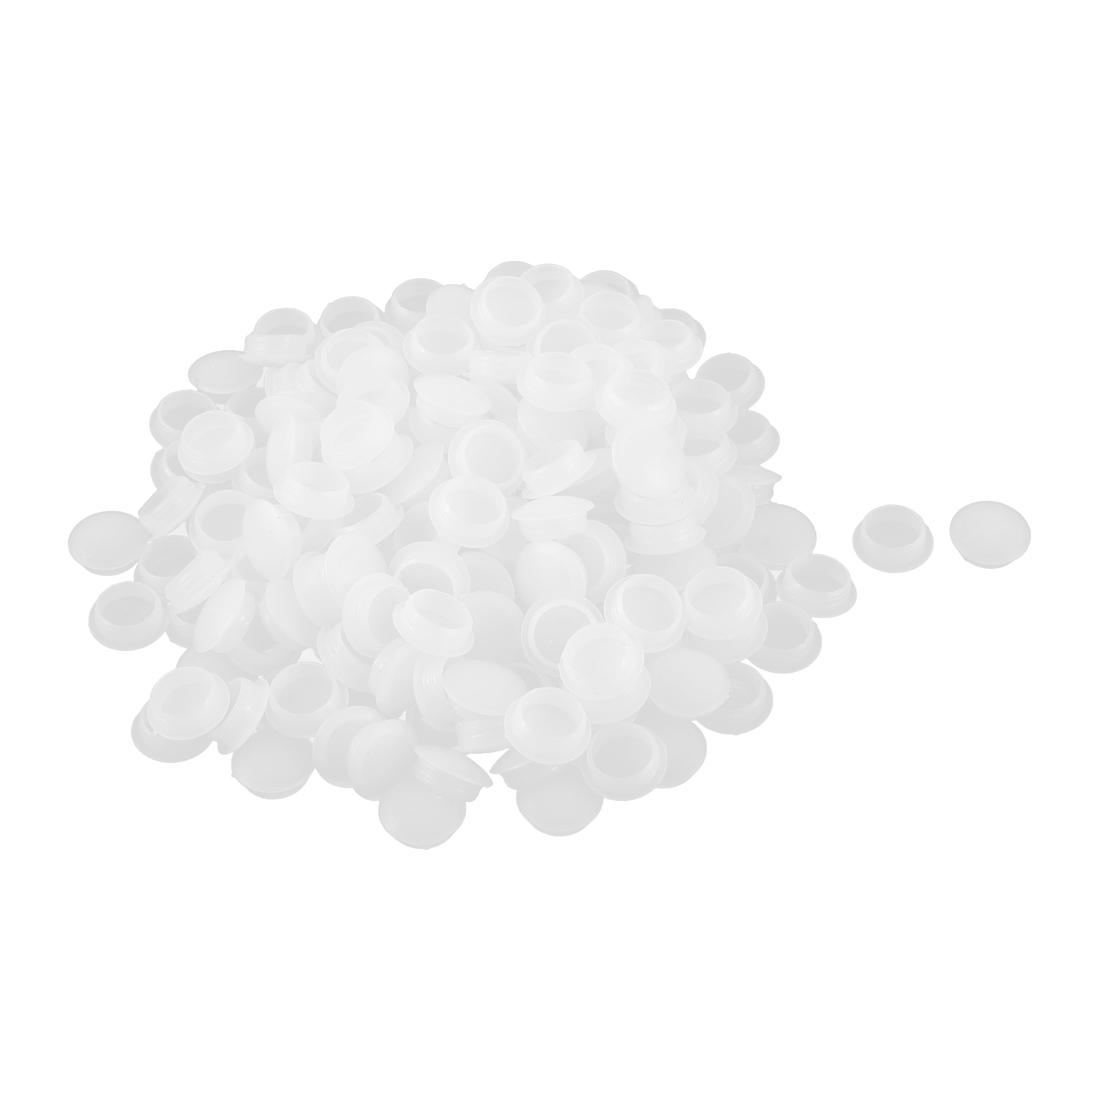 Office Plastic Flush Type Locking Hole Covers Cap Tube Insert Off White 200pcs